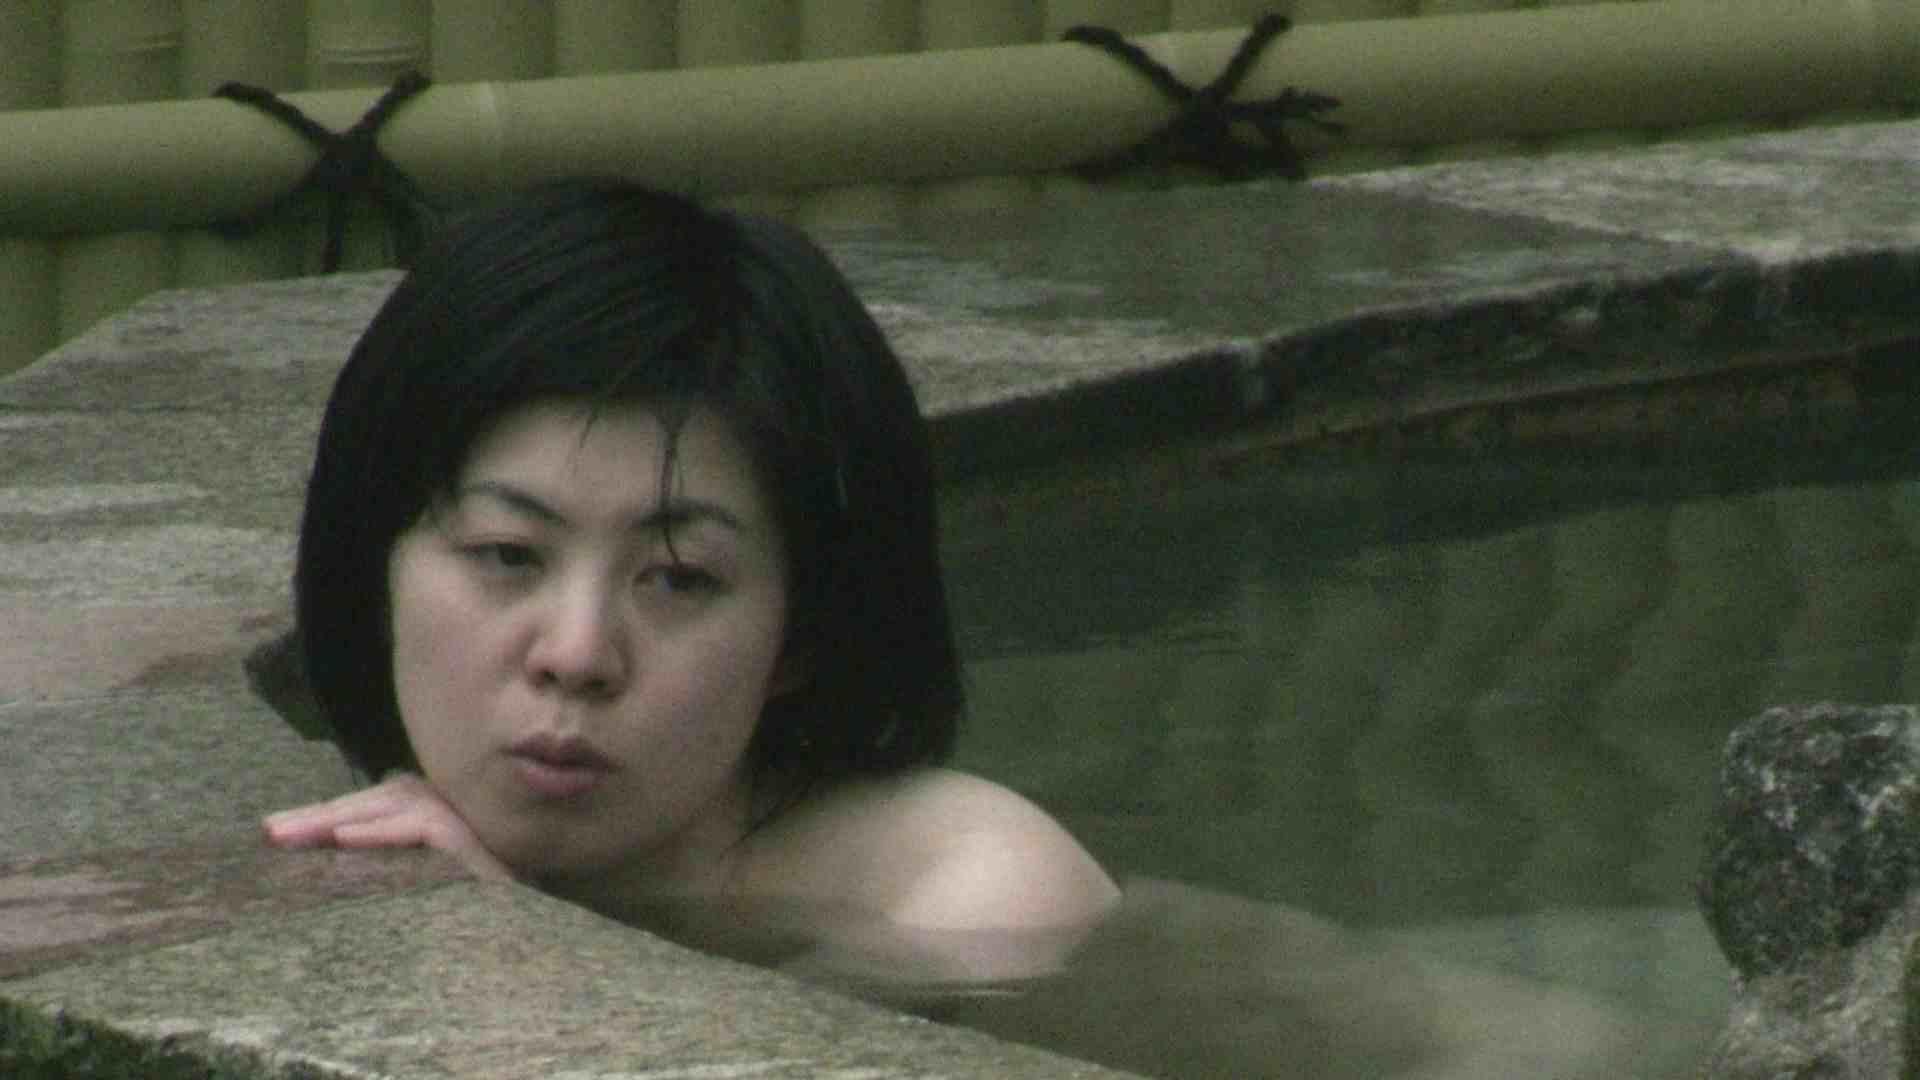 Aquaな露天風呂Vol.685 盗撮シリーズ | 露天風呂編  95PIX 61